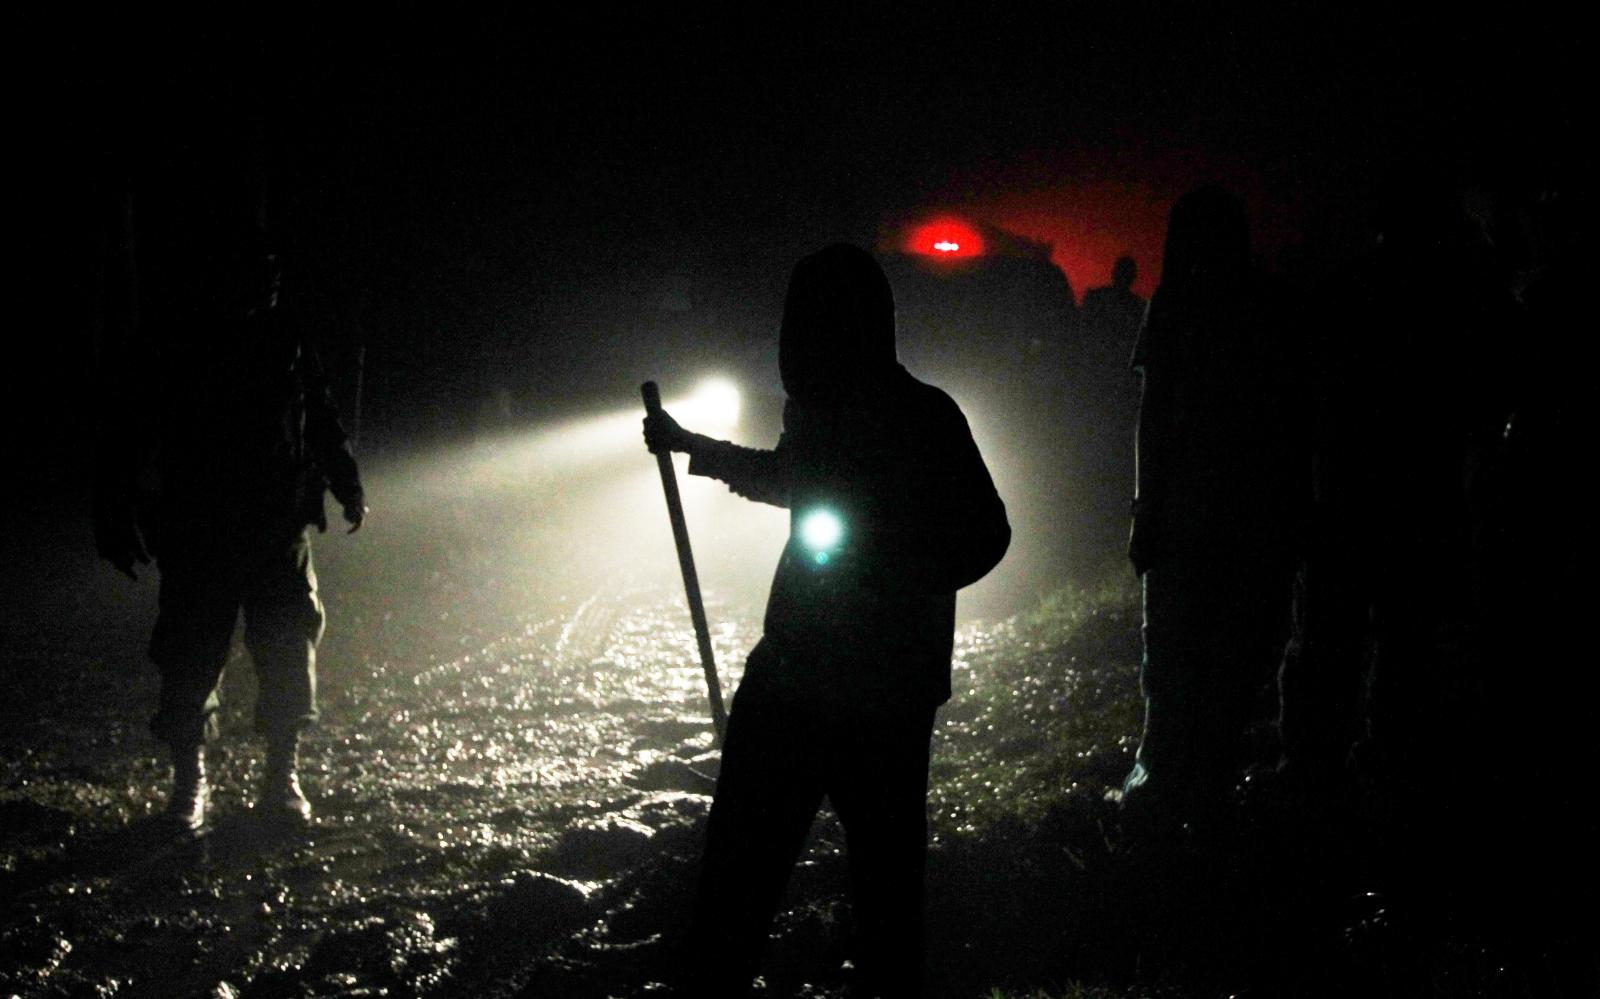 Chapecoense plane crash rescuers